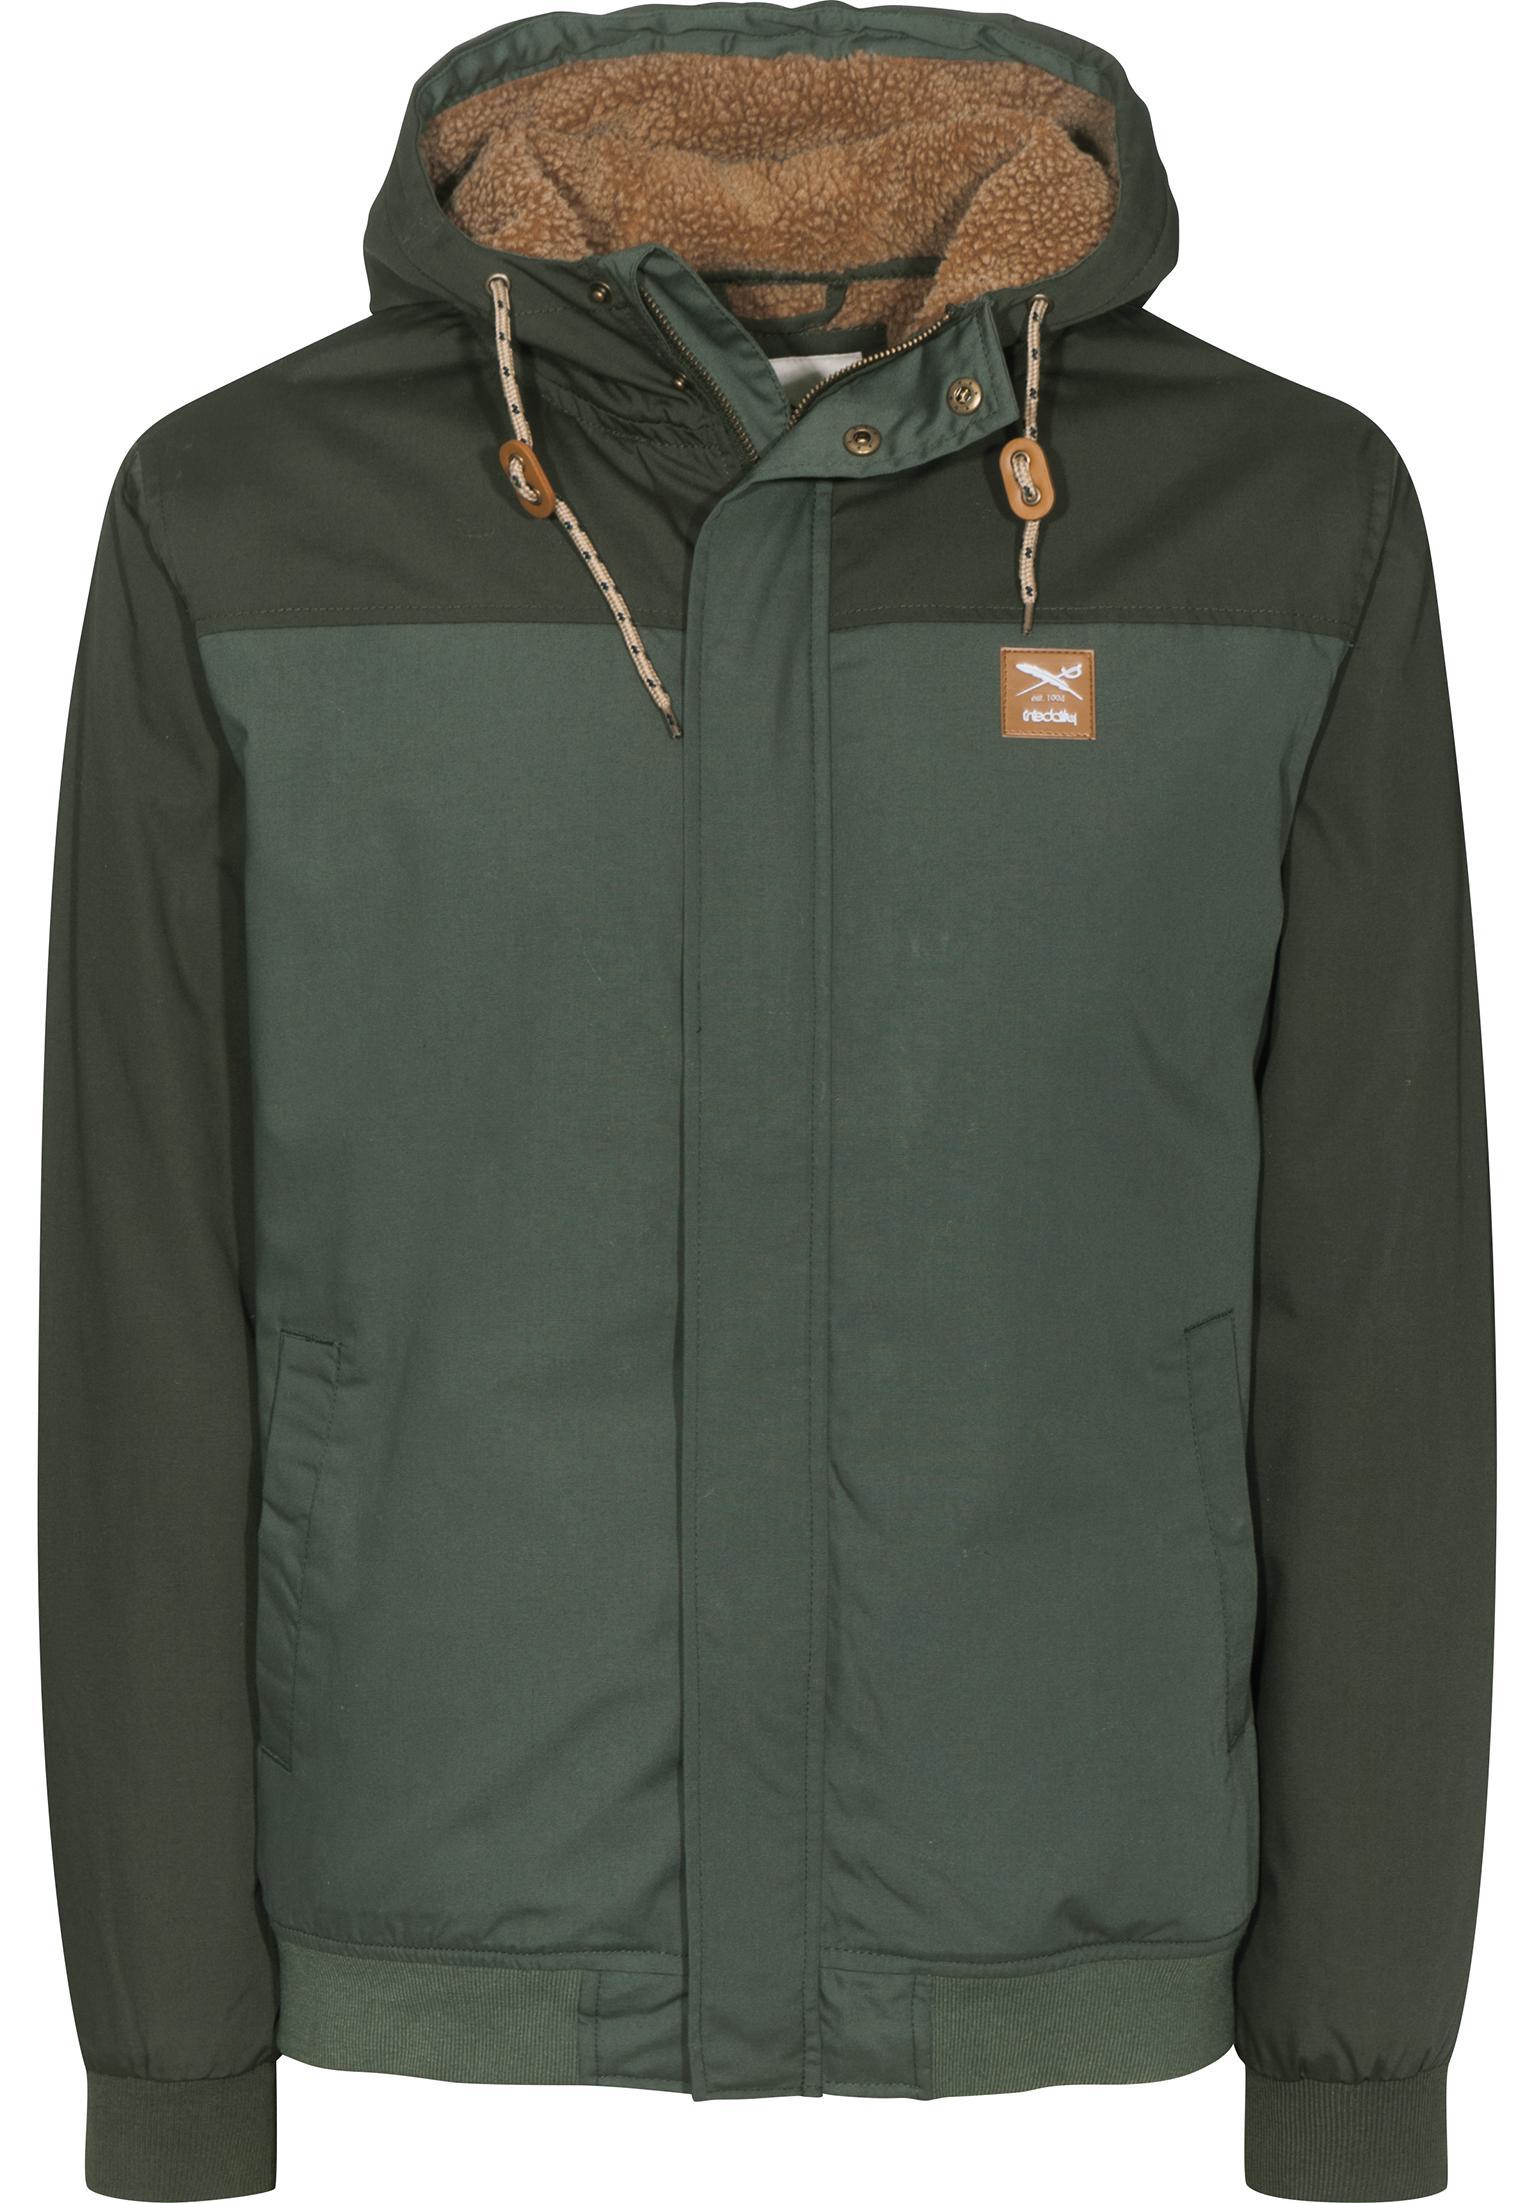 Eissegler Jacket iriedaily Winterjacken in olivegrey für Herren   Titus fcf18d1837